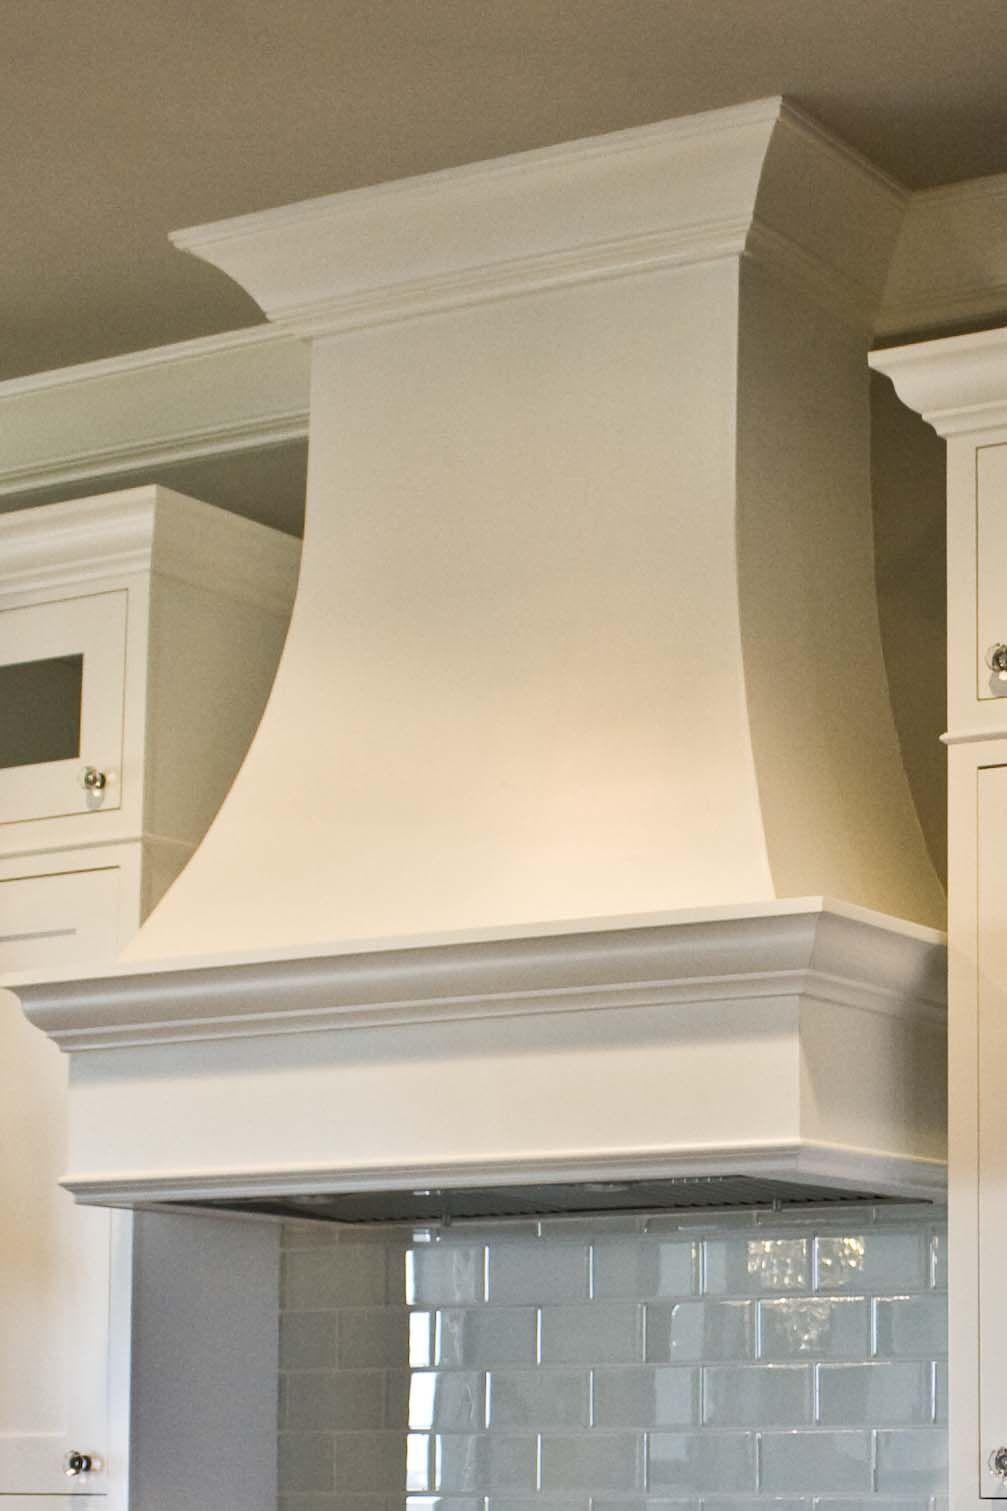 5 Custom Curved Drywall Range Hood It Was Painted To